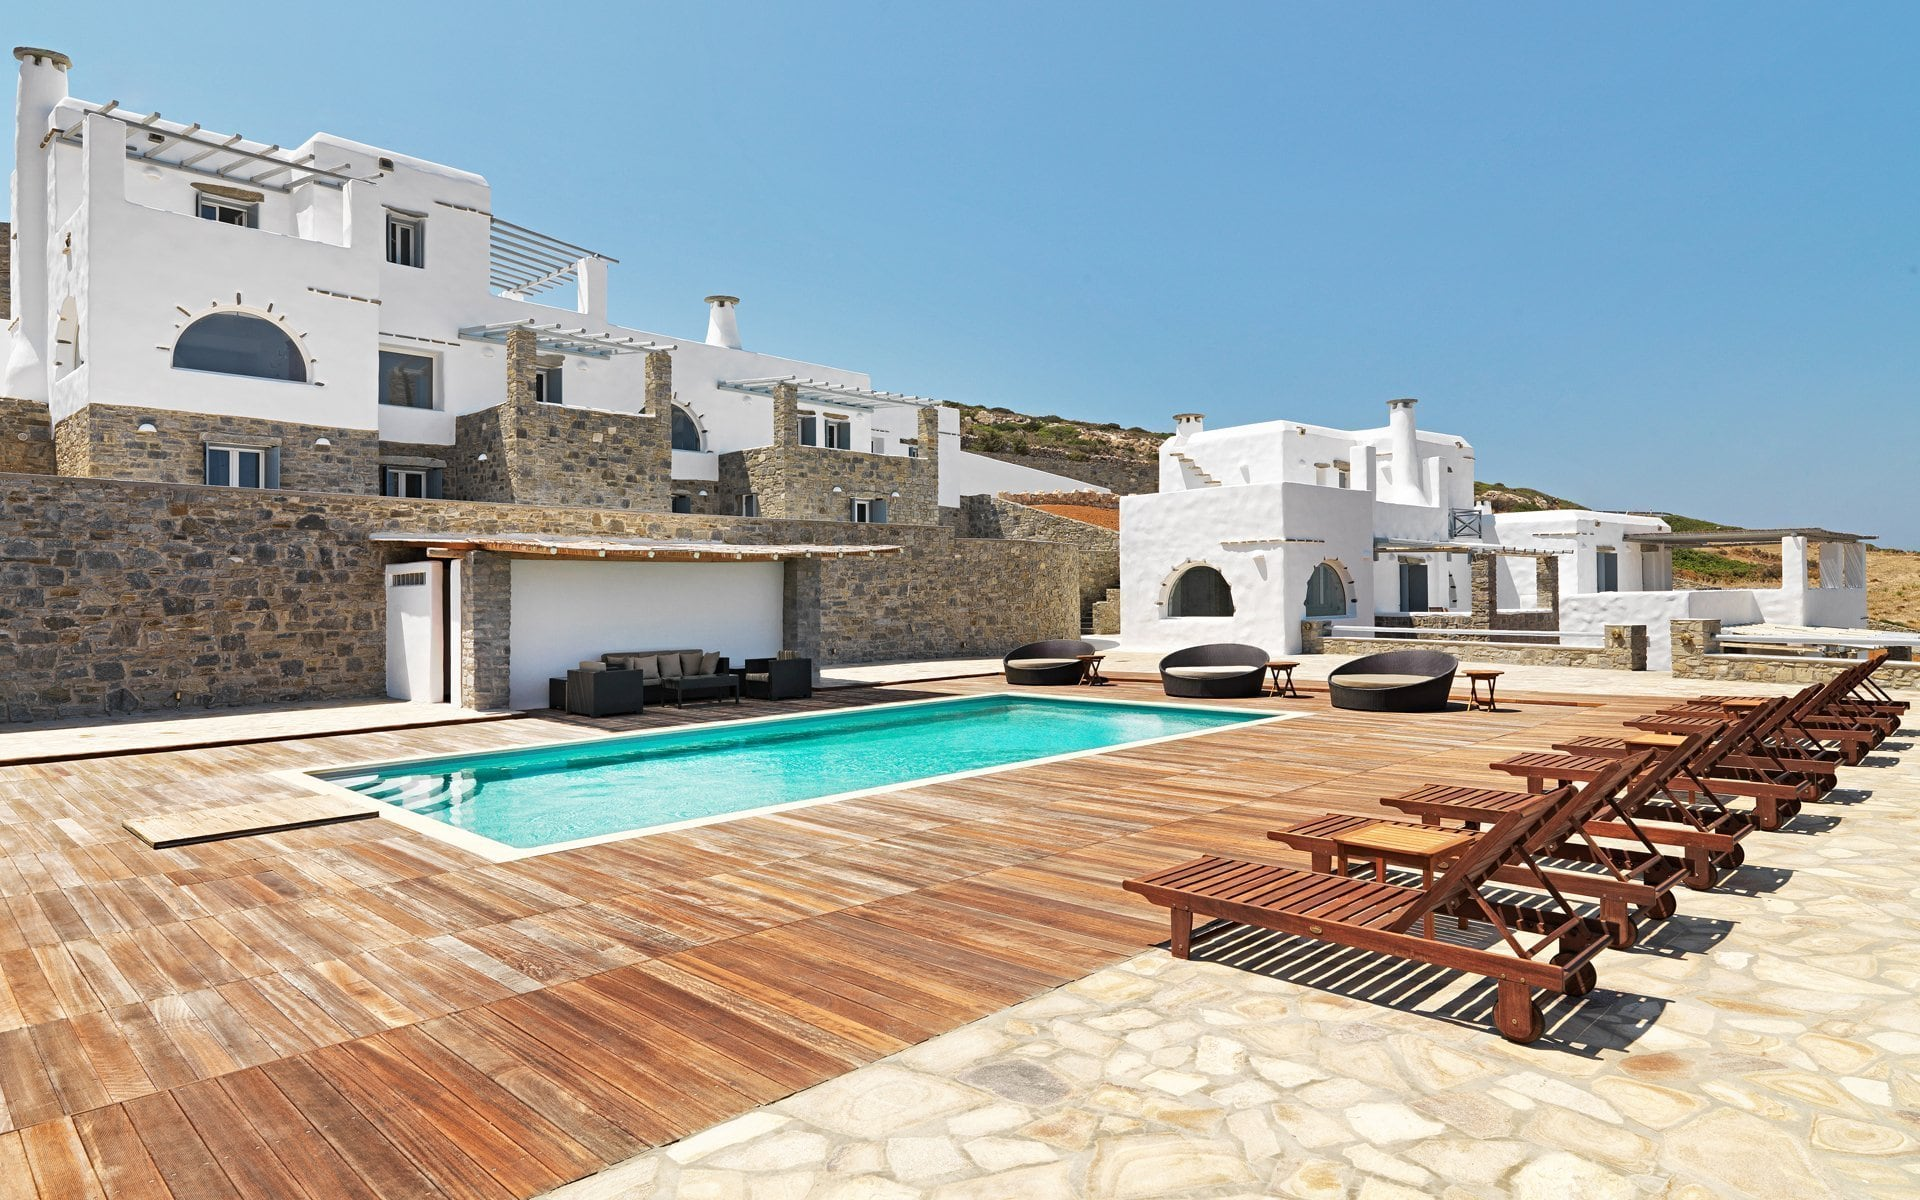 Casa, Paros - Ref GR-3933